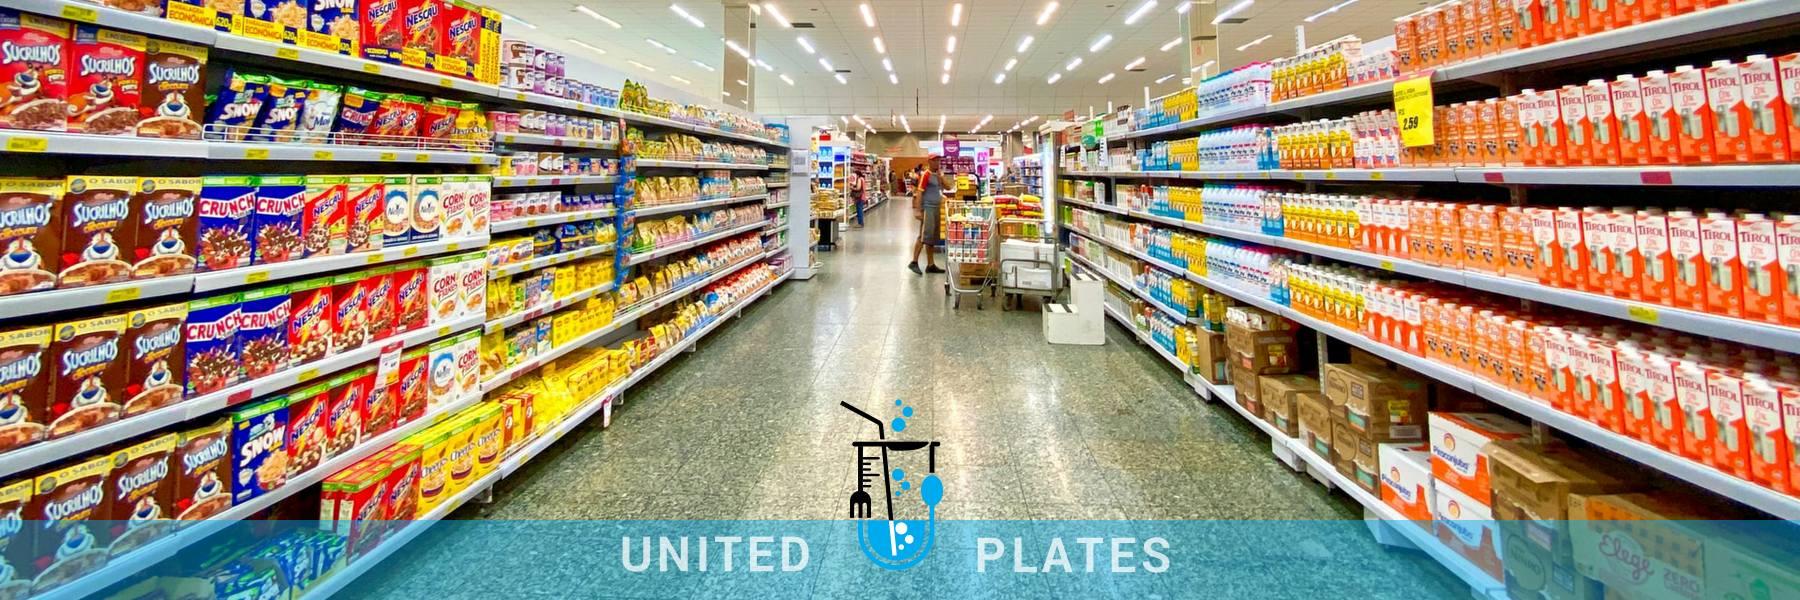 united plates consumer food consultancy dublin ireland